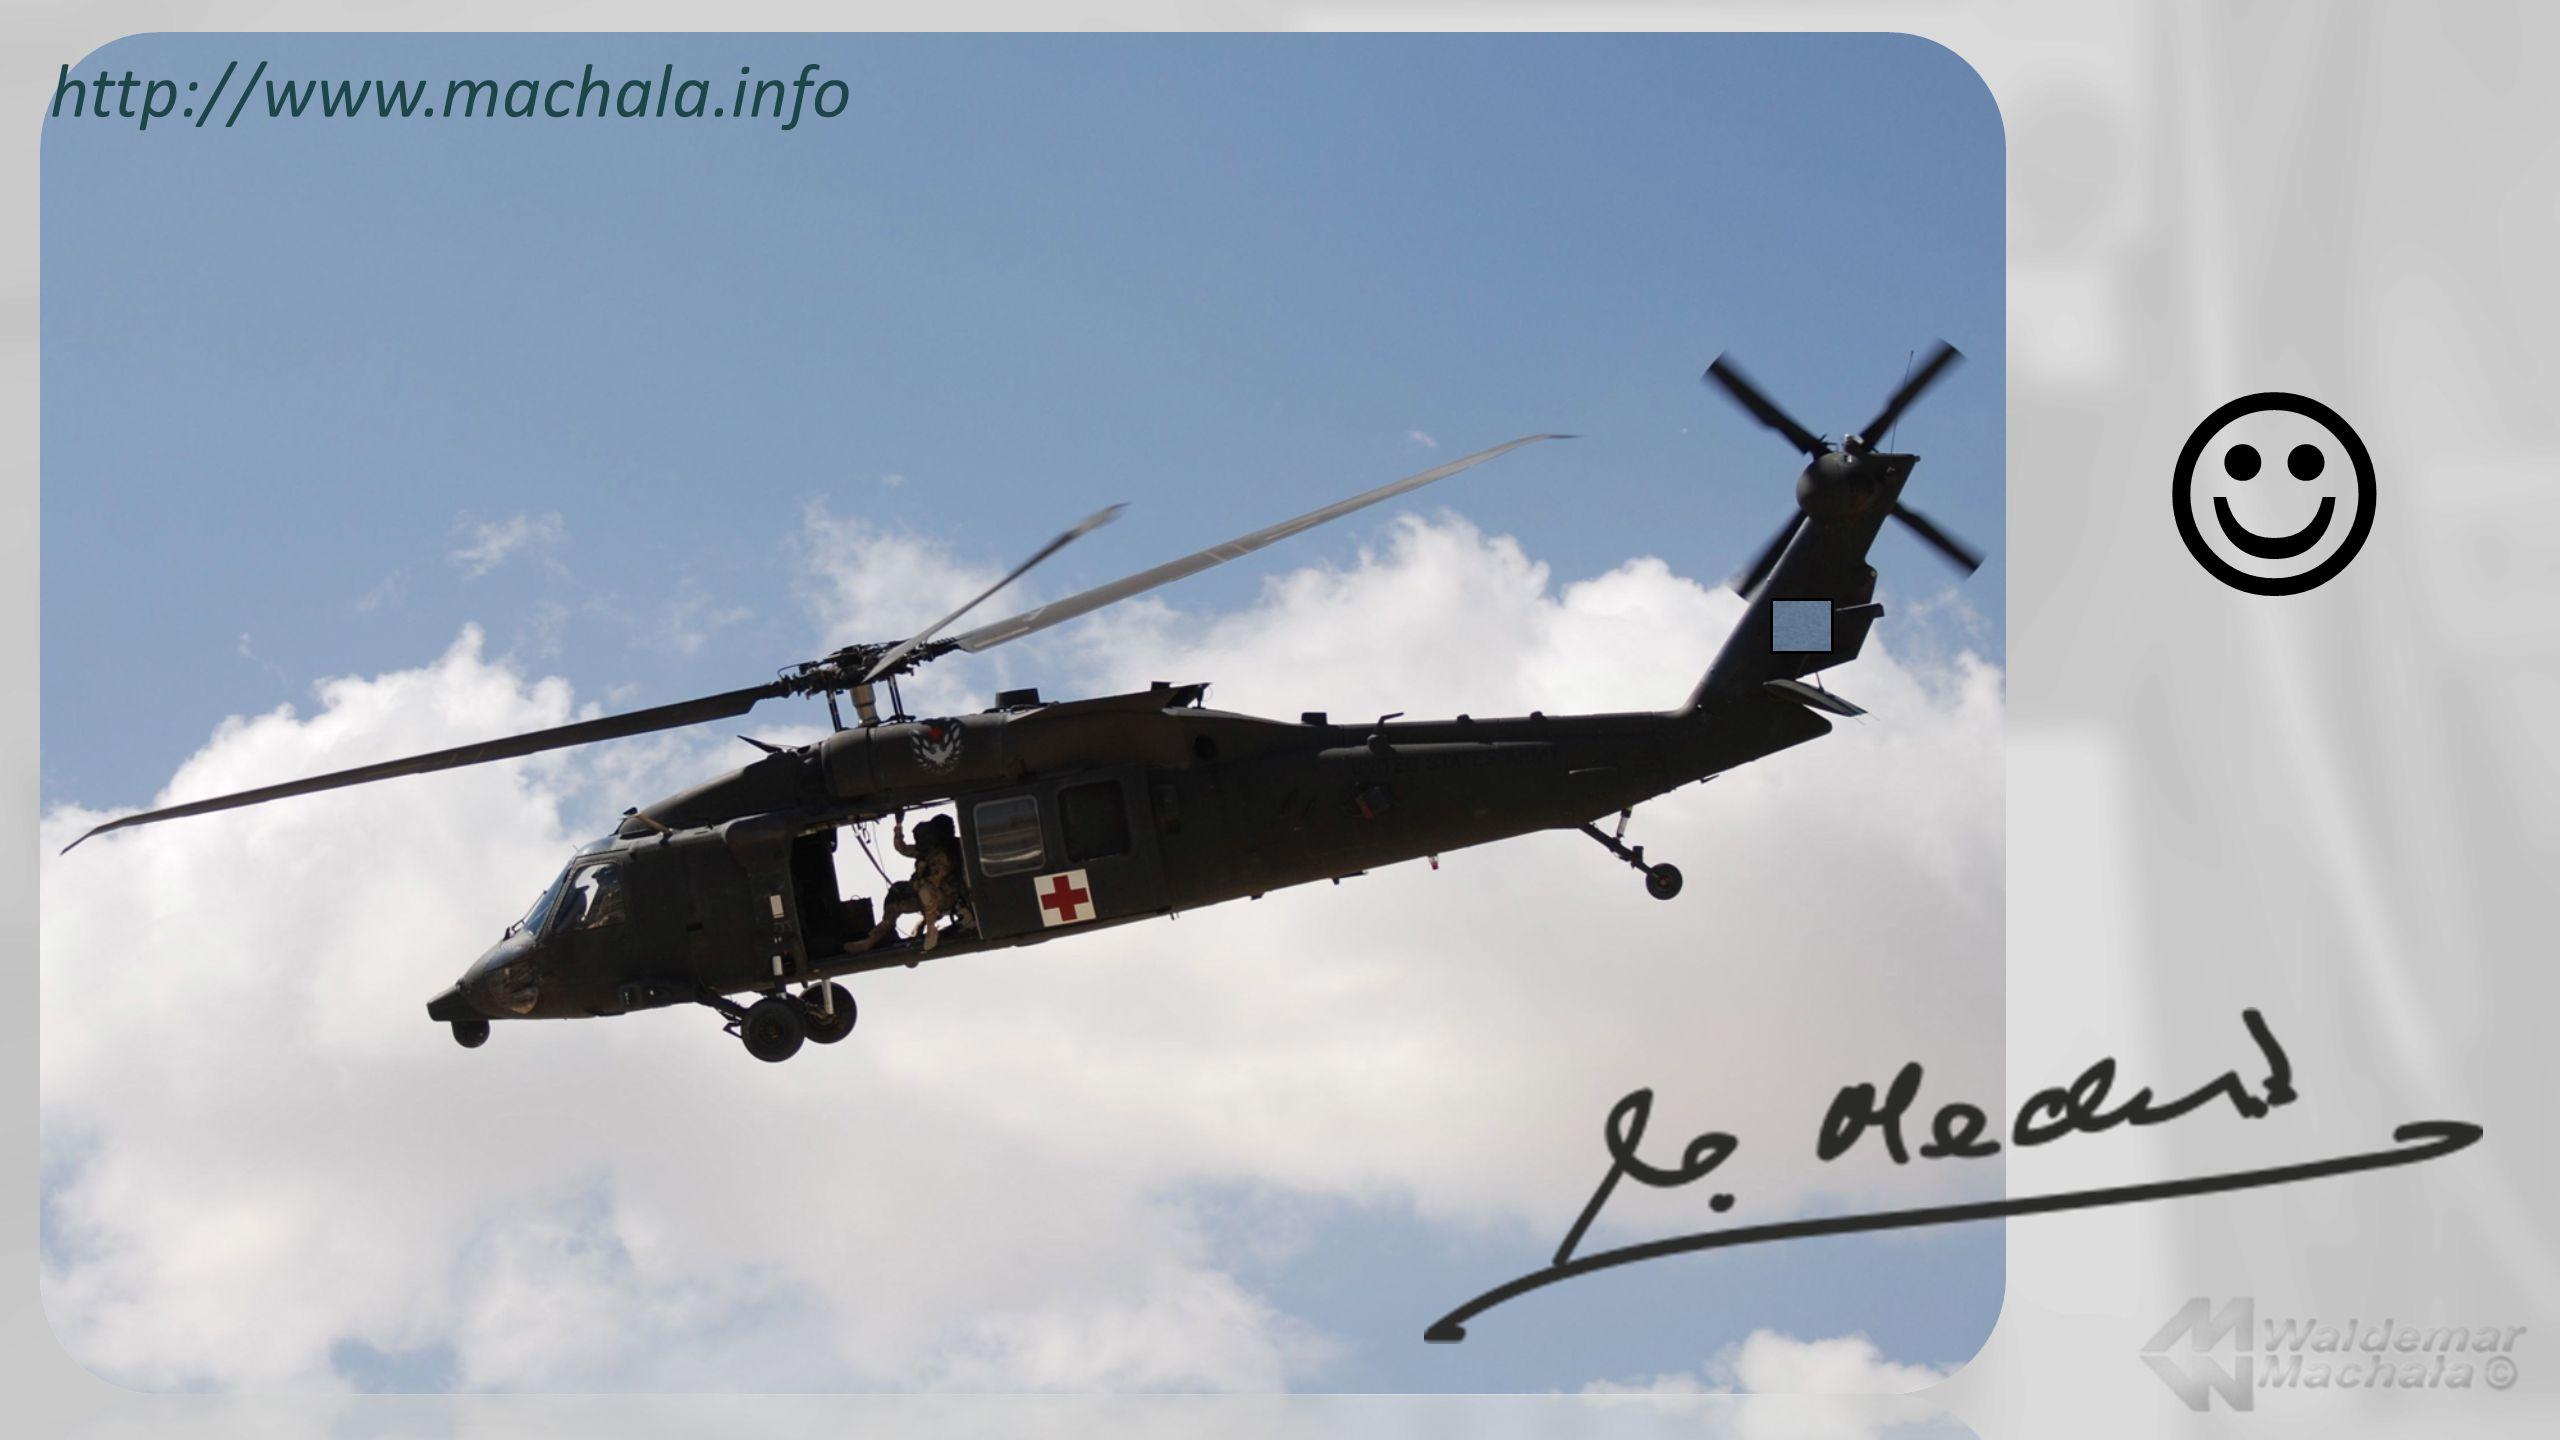 http://www.machala.info